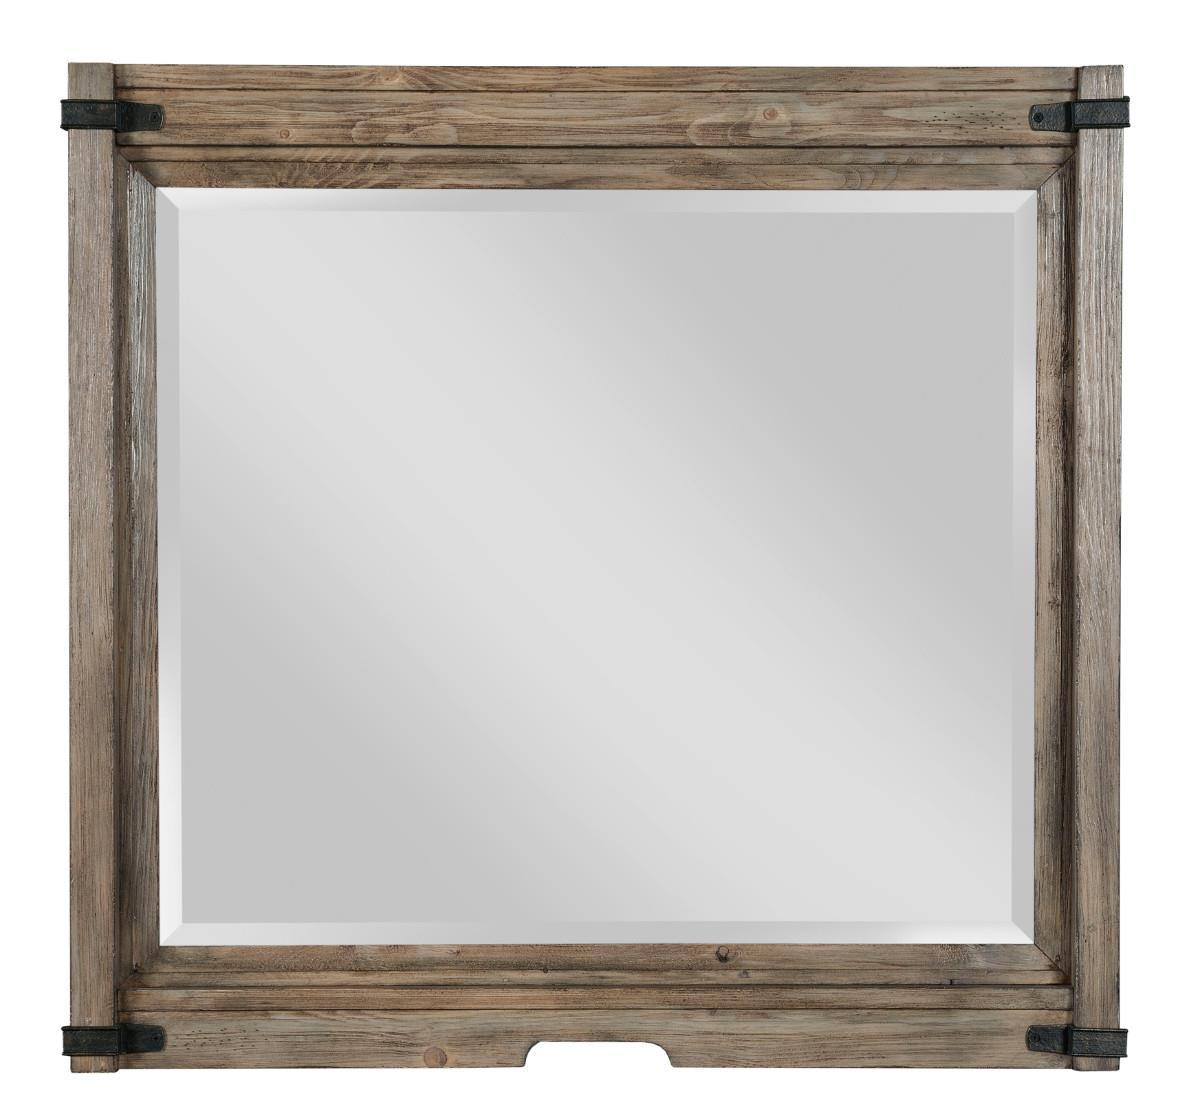 Rustic Bureau Mirror with Bracket Detail